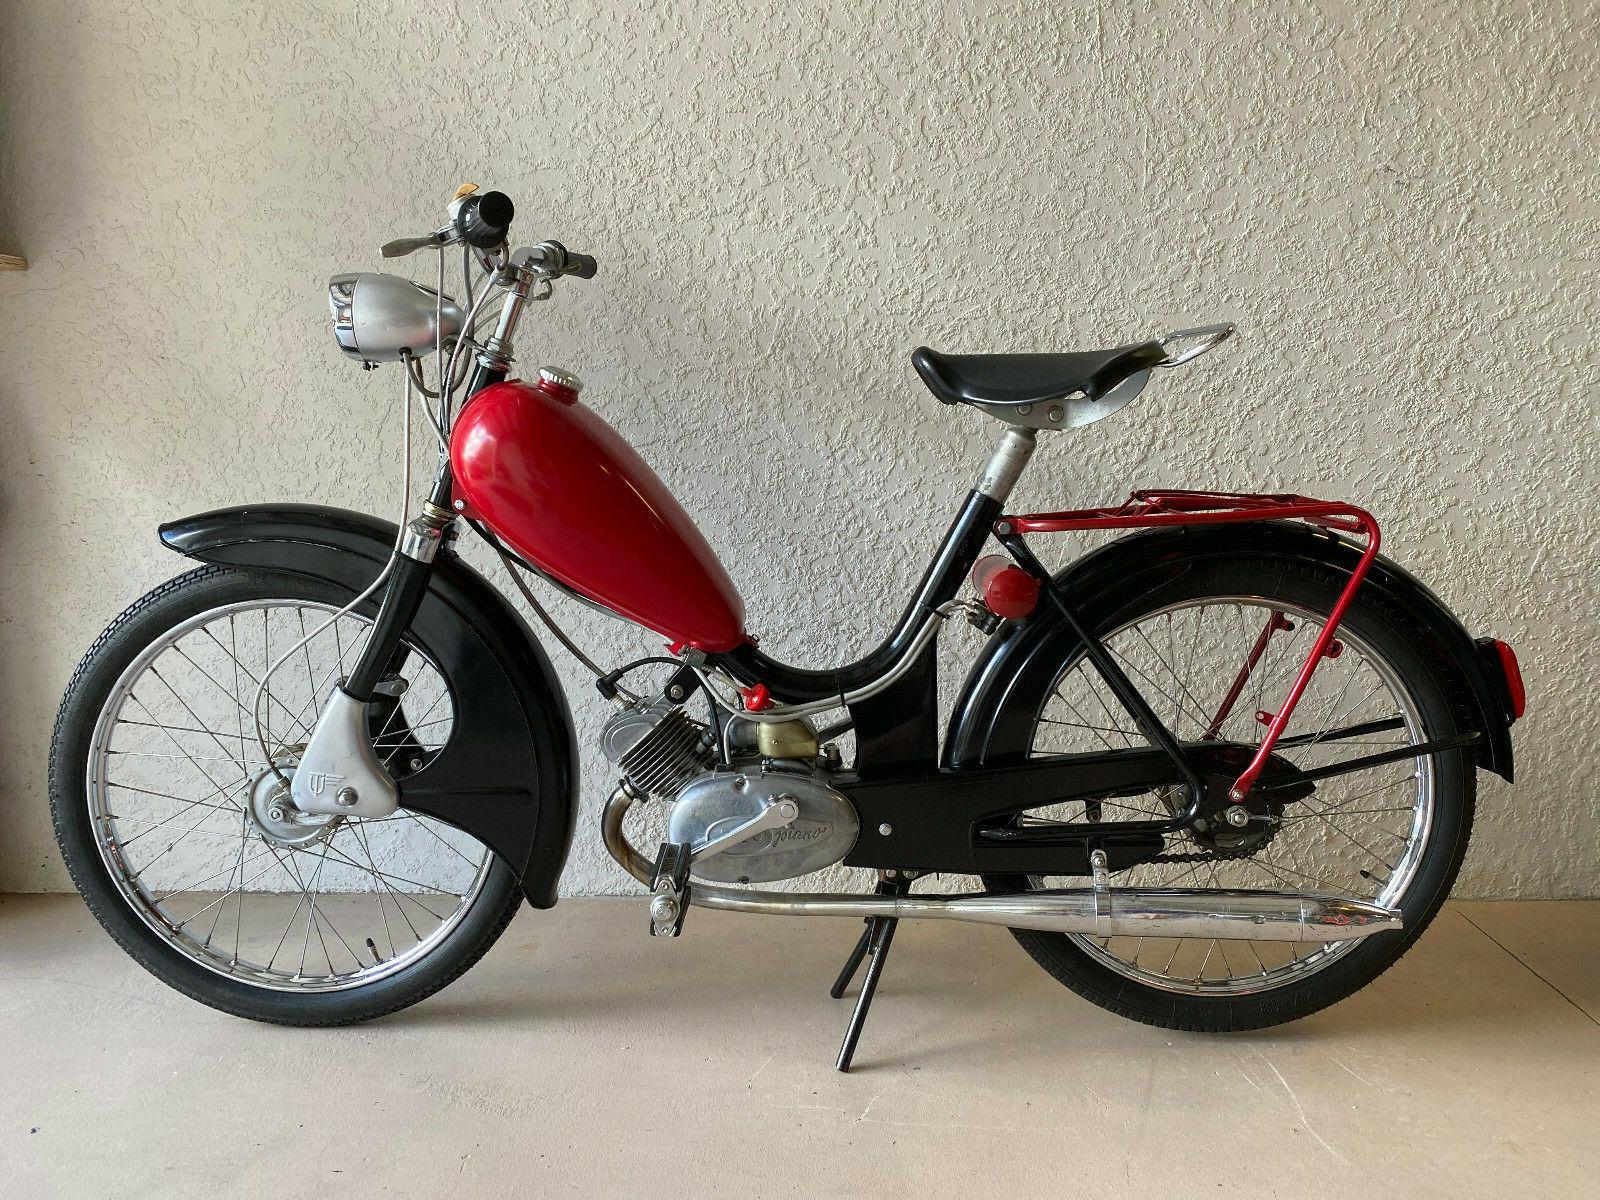 UT German Moped, JLO piano, G50 2 speed